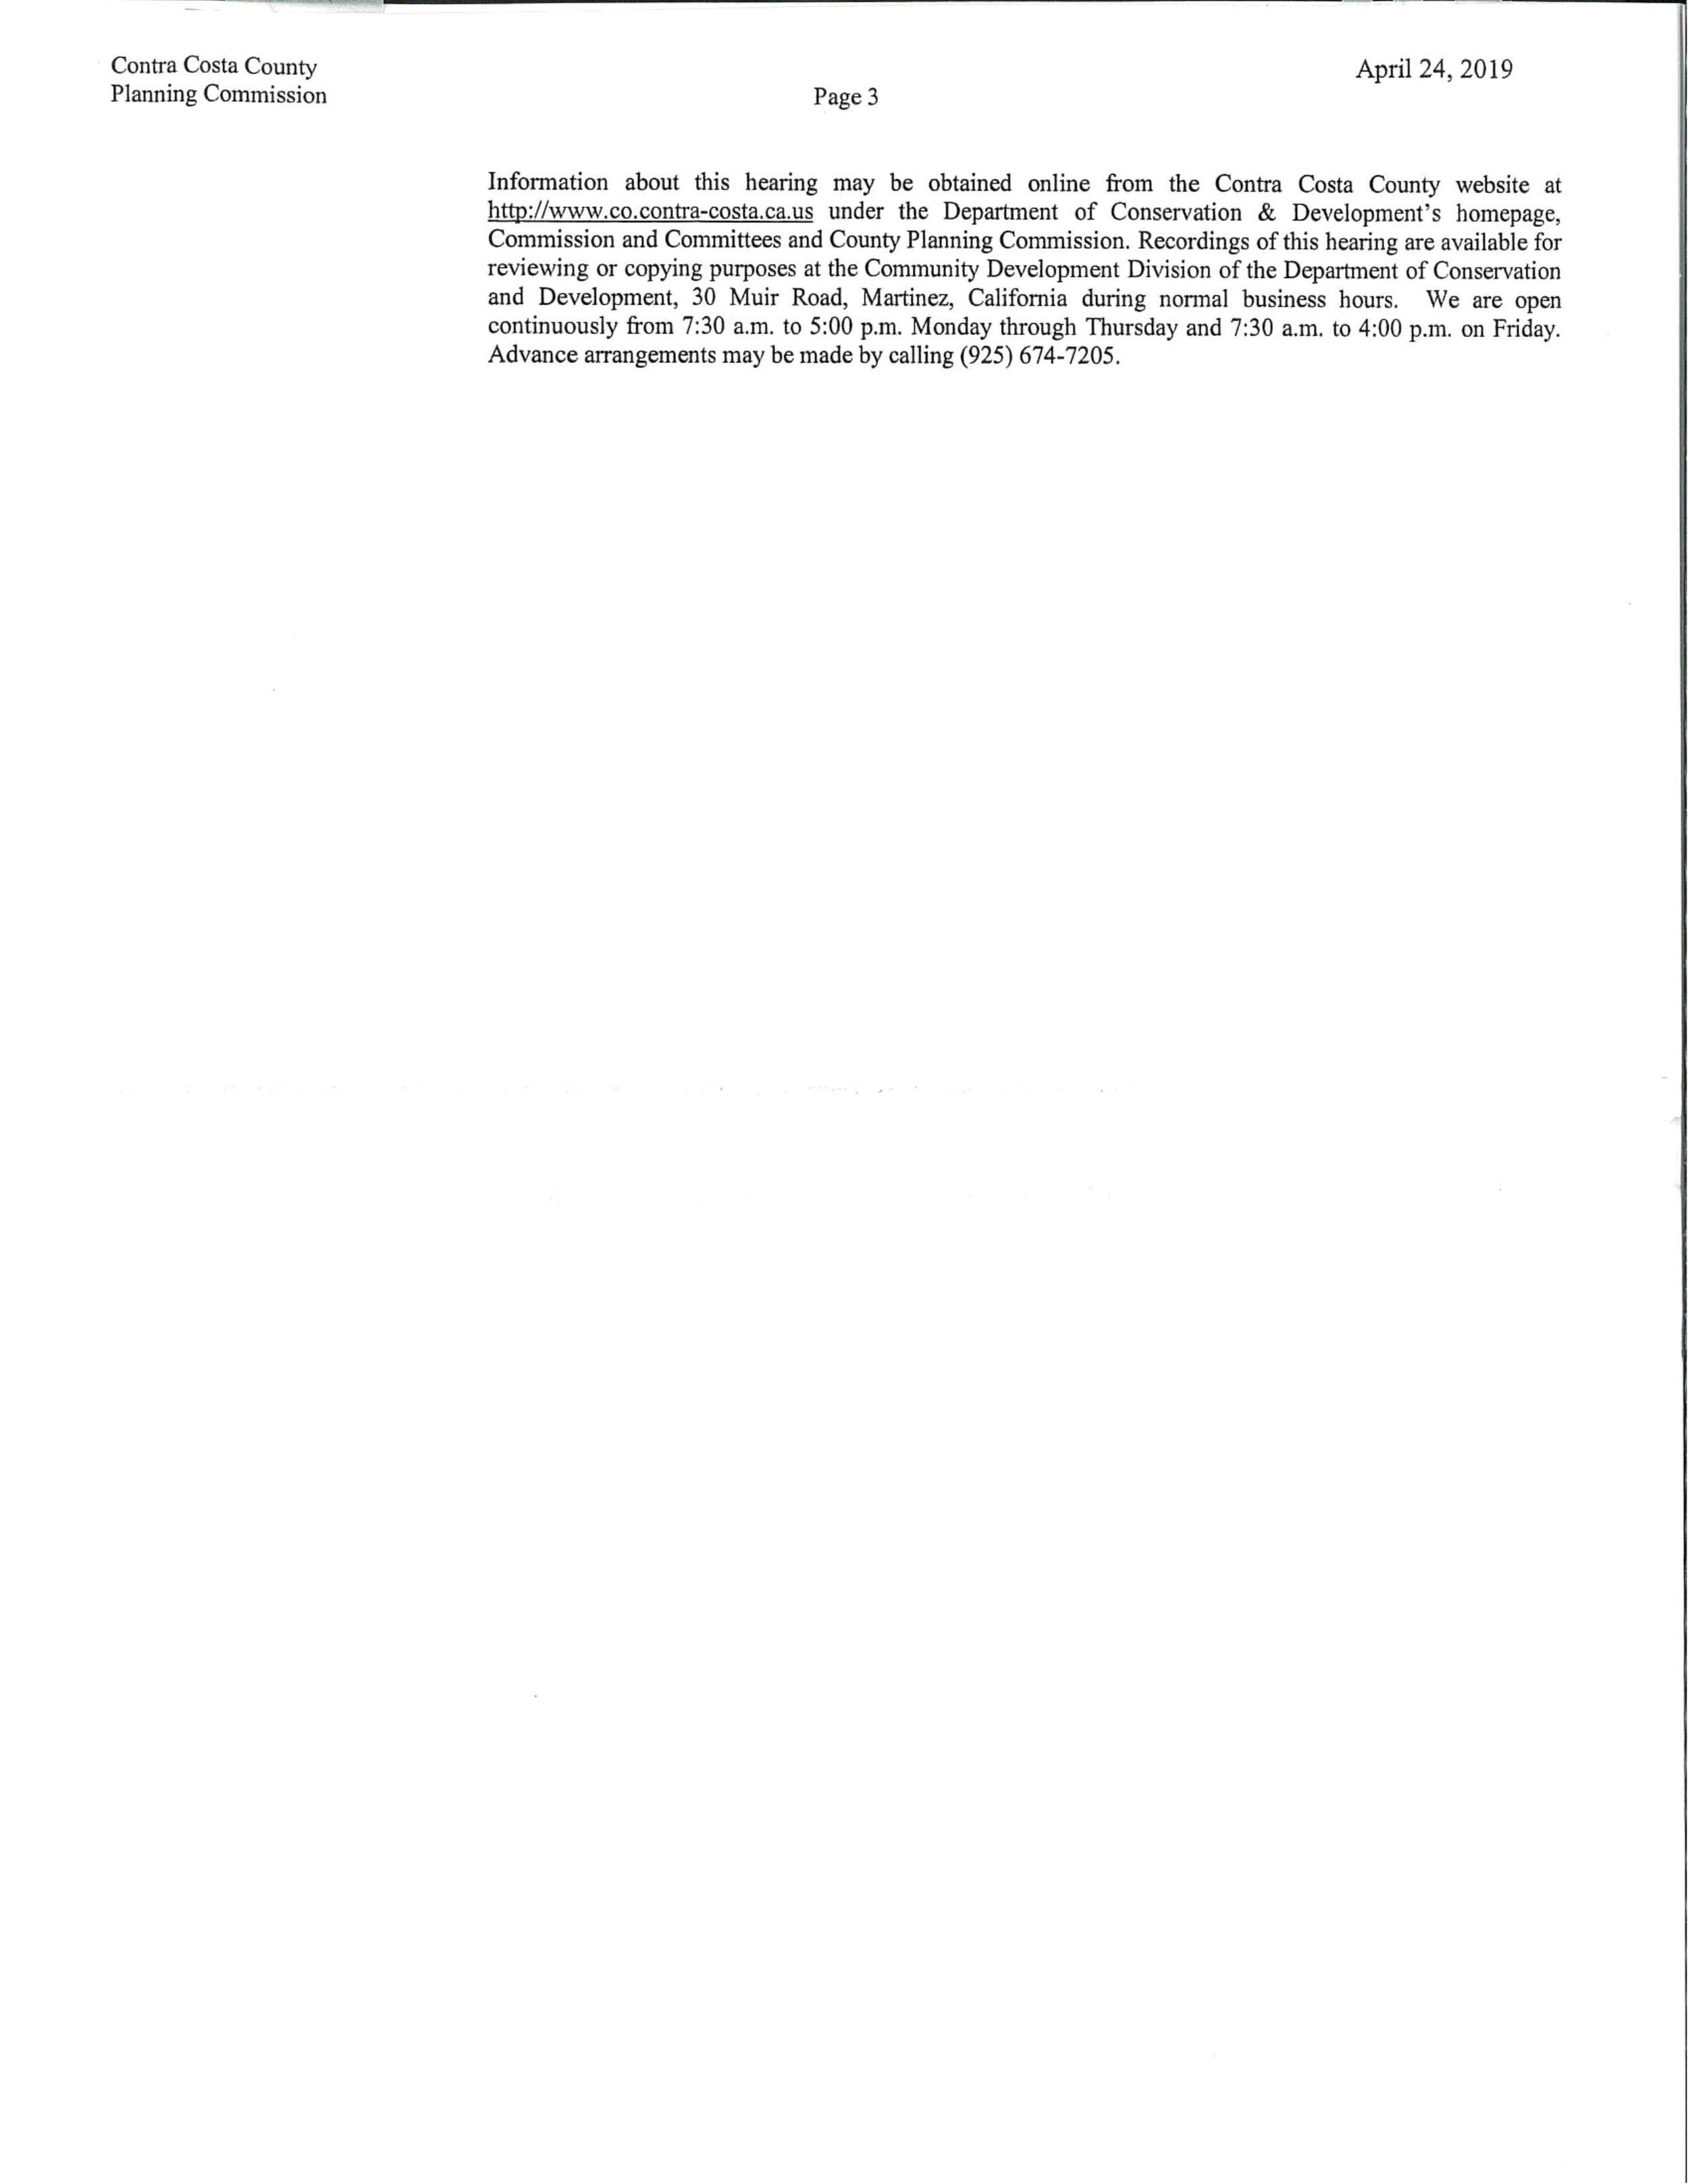 ESMAC Agenda 5.8.2019b_9.jpg